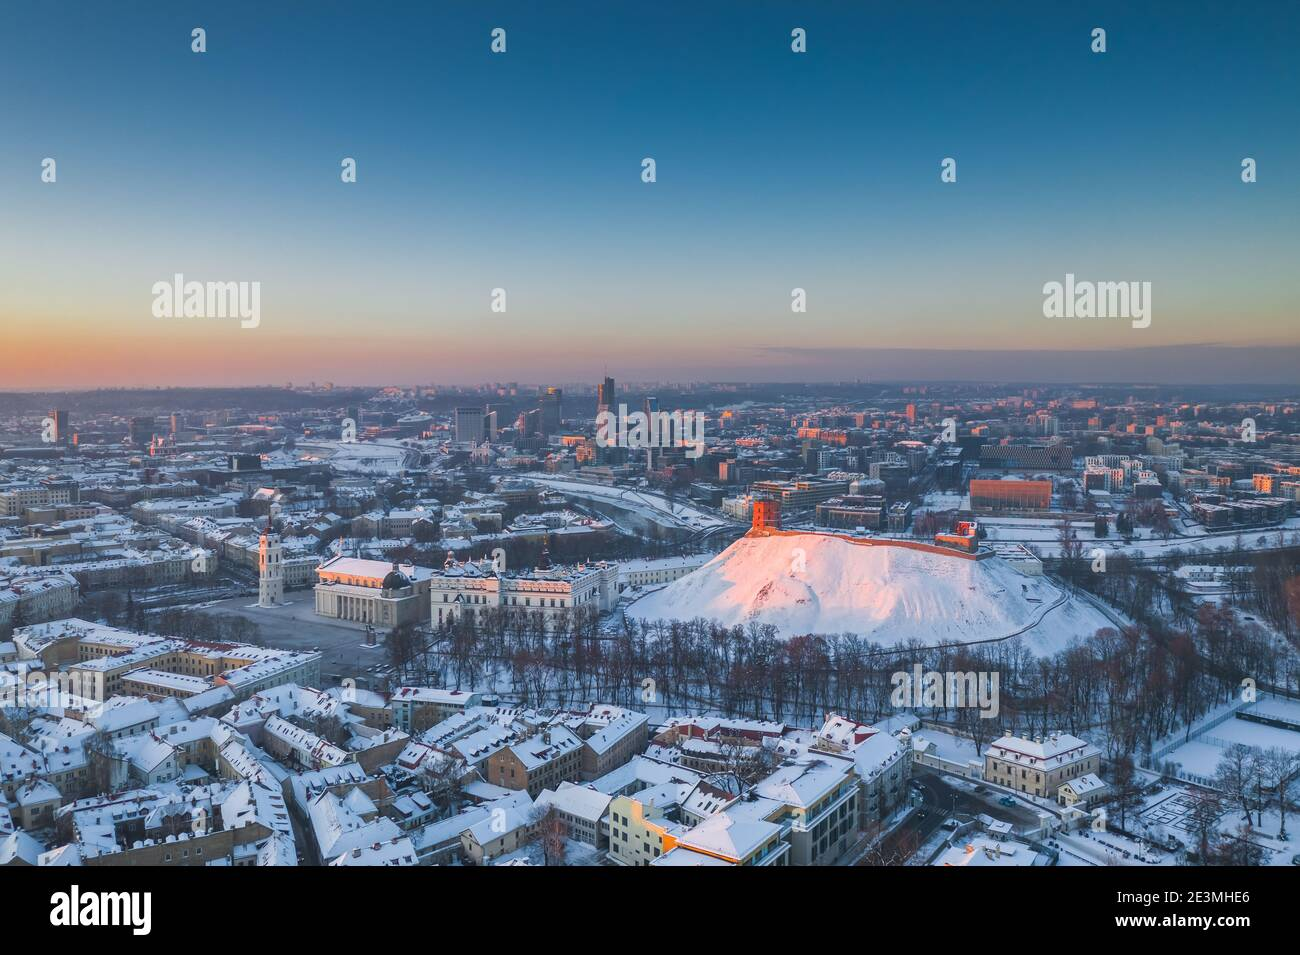 Paisaje aéreo de la ciudad de Vilnius, capital de Lituania Foto de stock